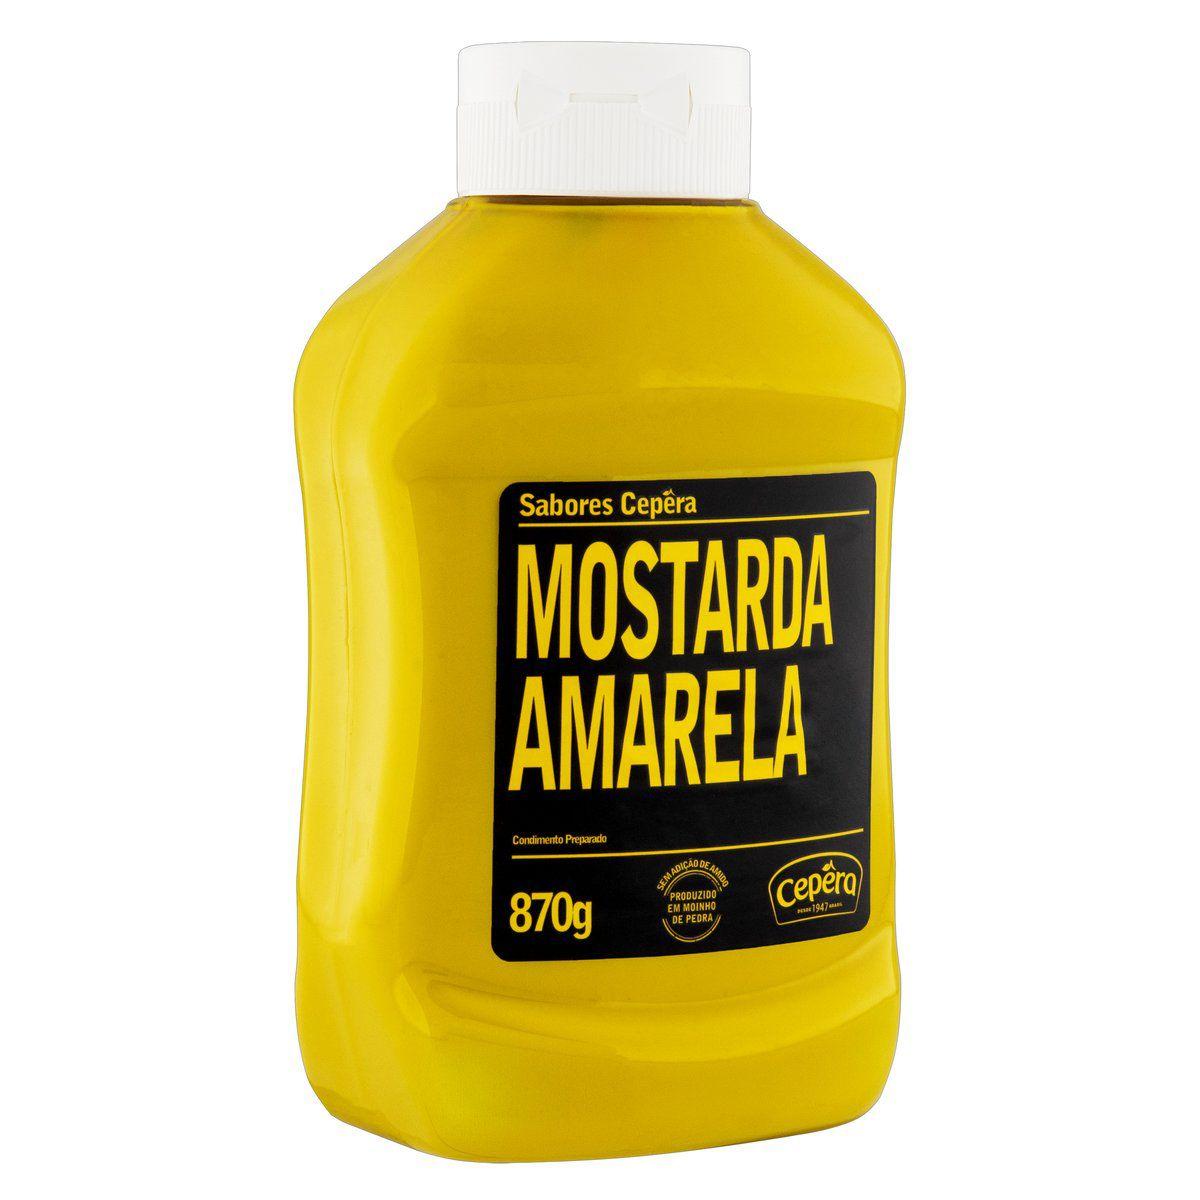 Mostarda Amarela 870g